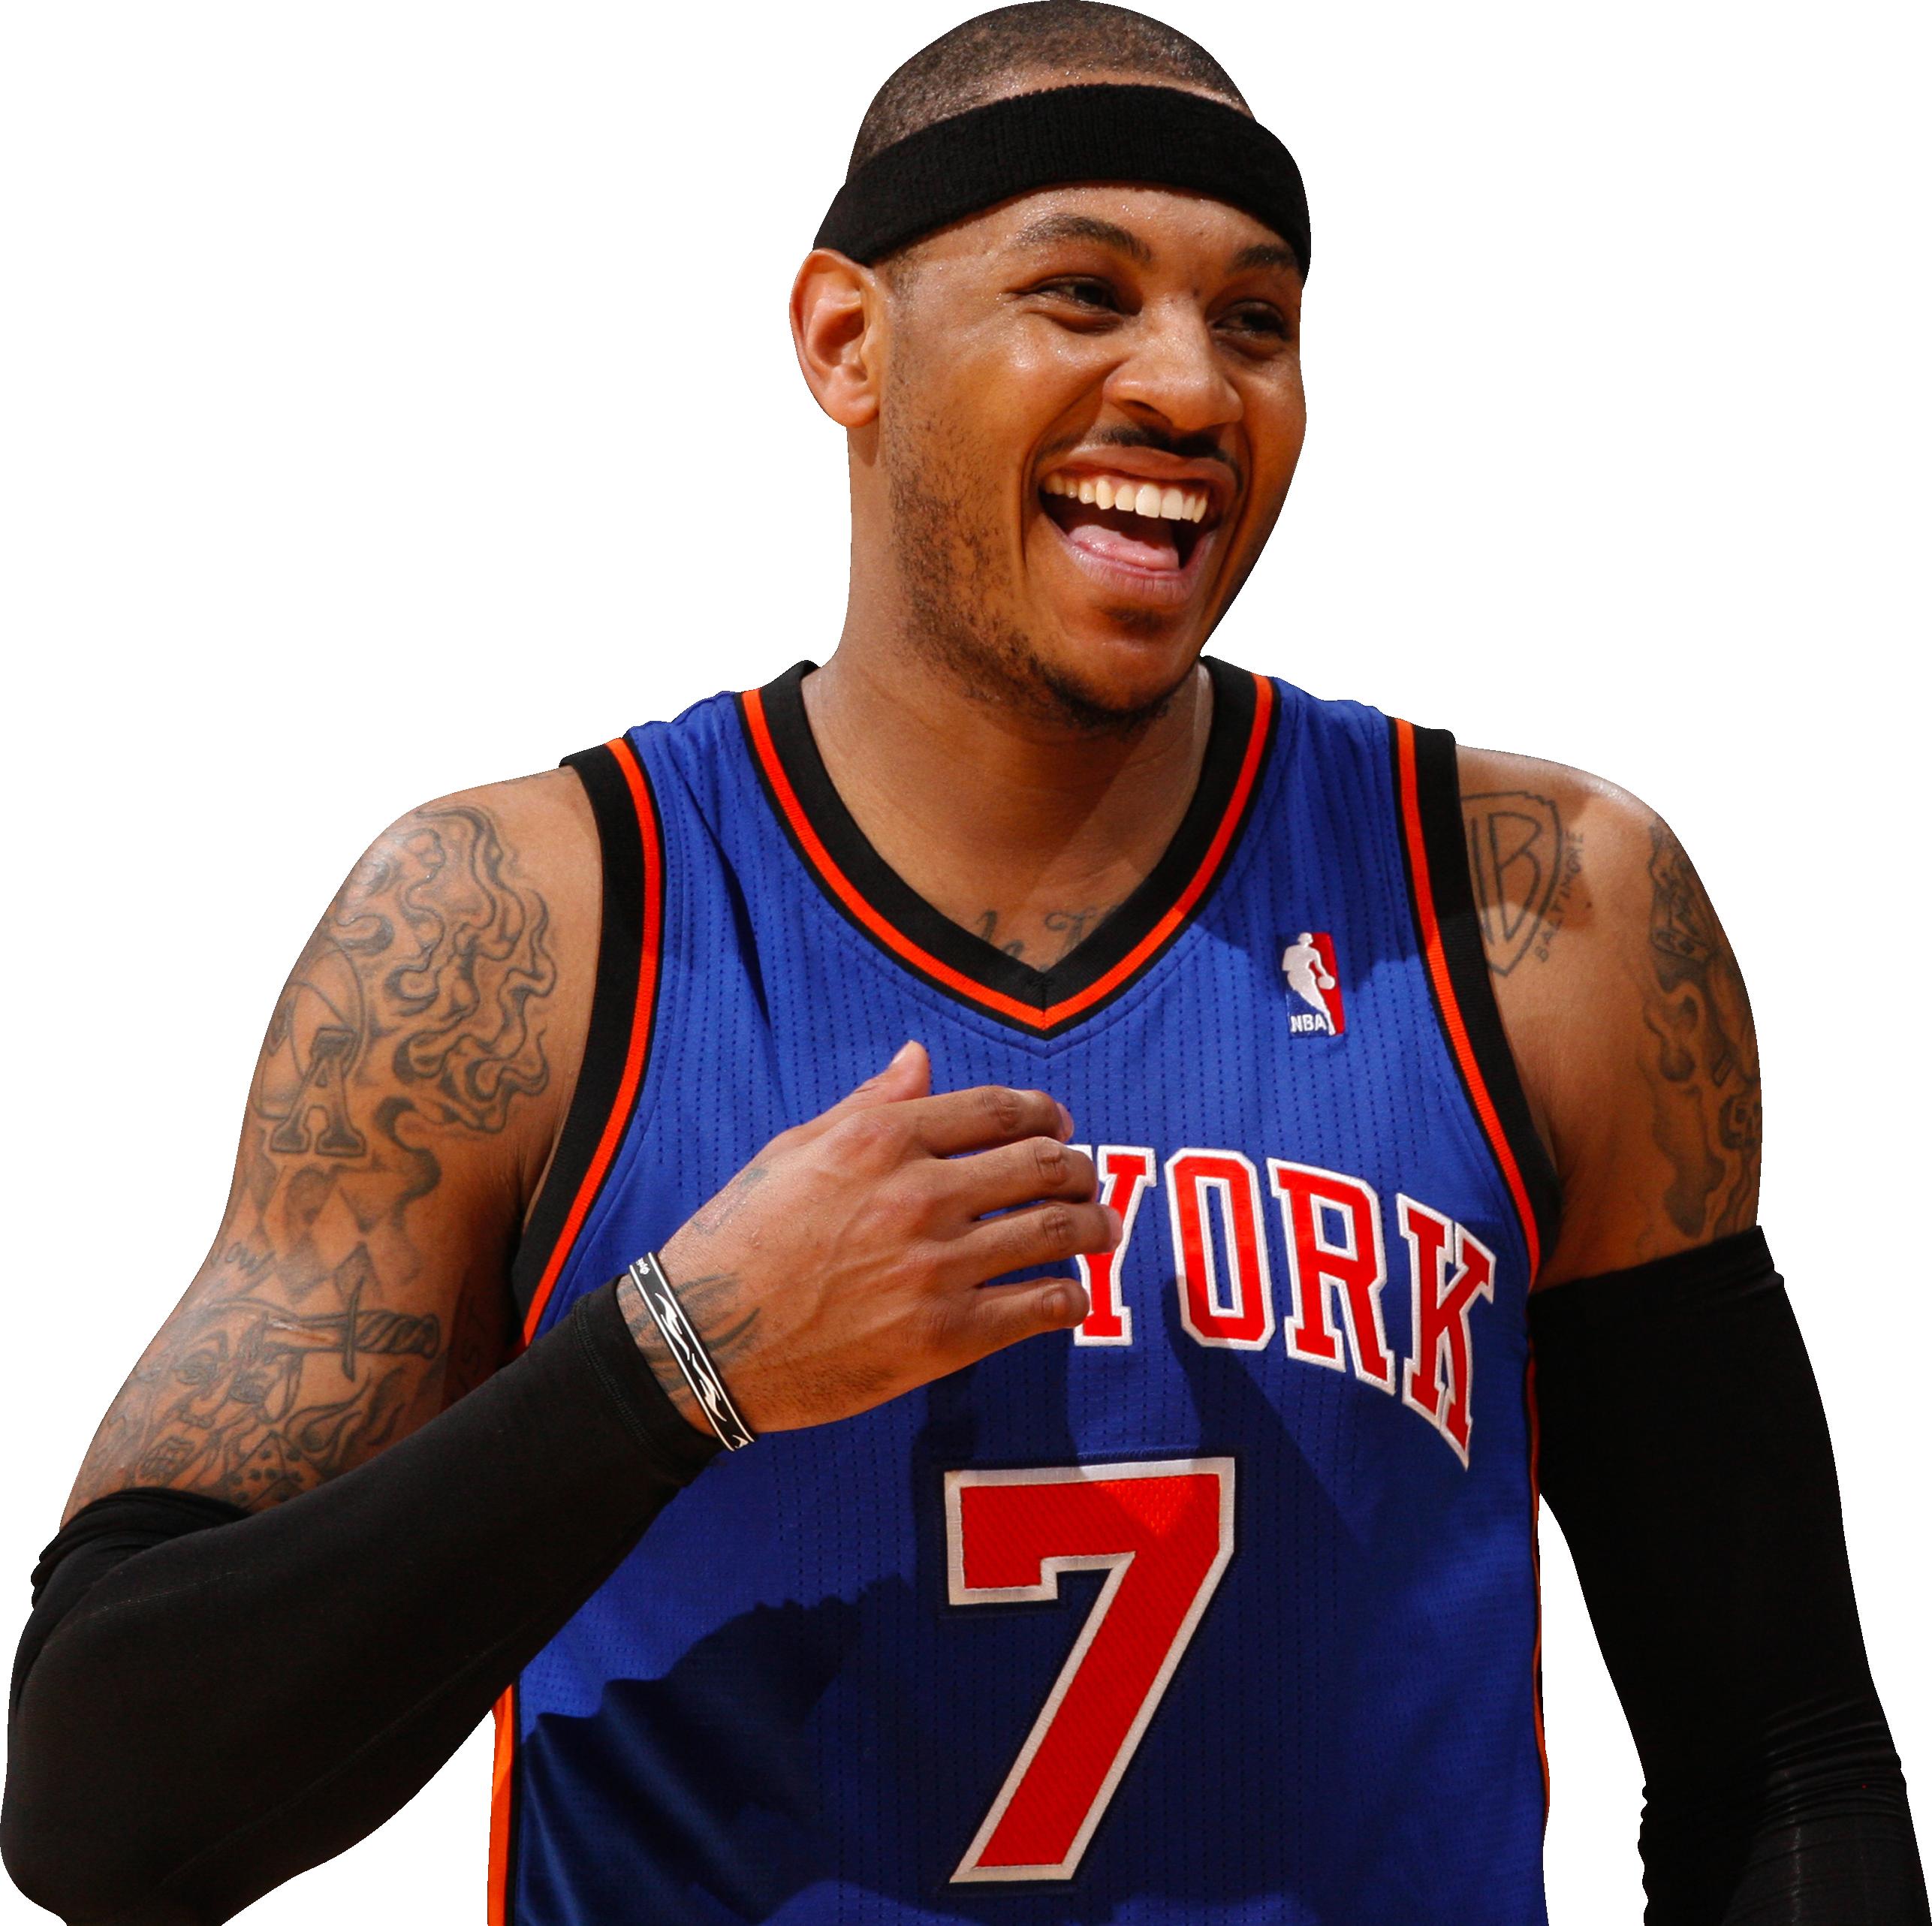 Sportz Insomnia Cut Gallery - New York Knicks